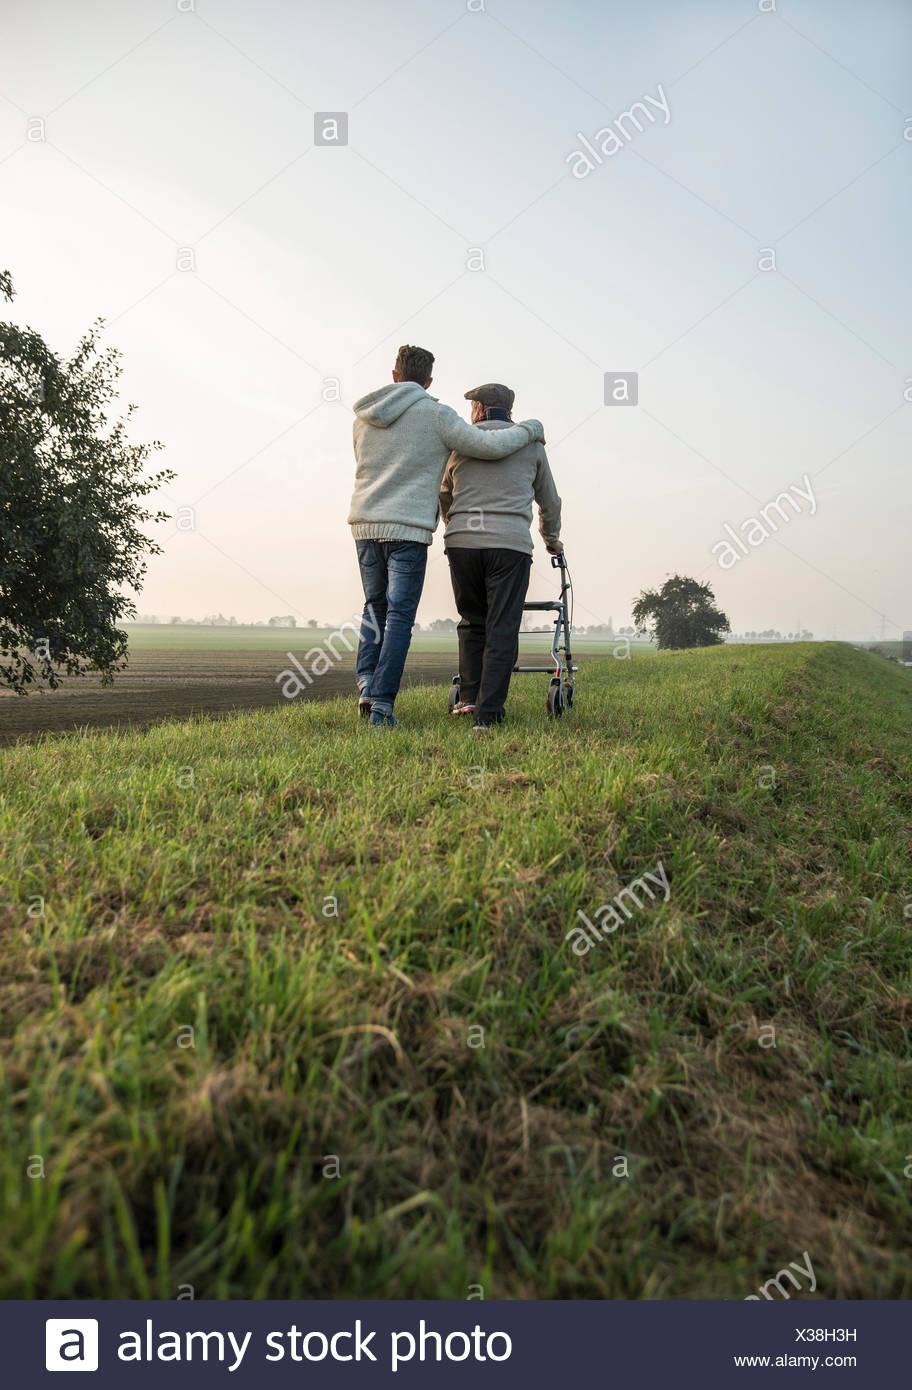 Senior man and grandson in rural landscape with wheeled walker - Stock Image